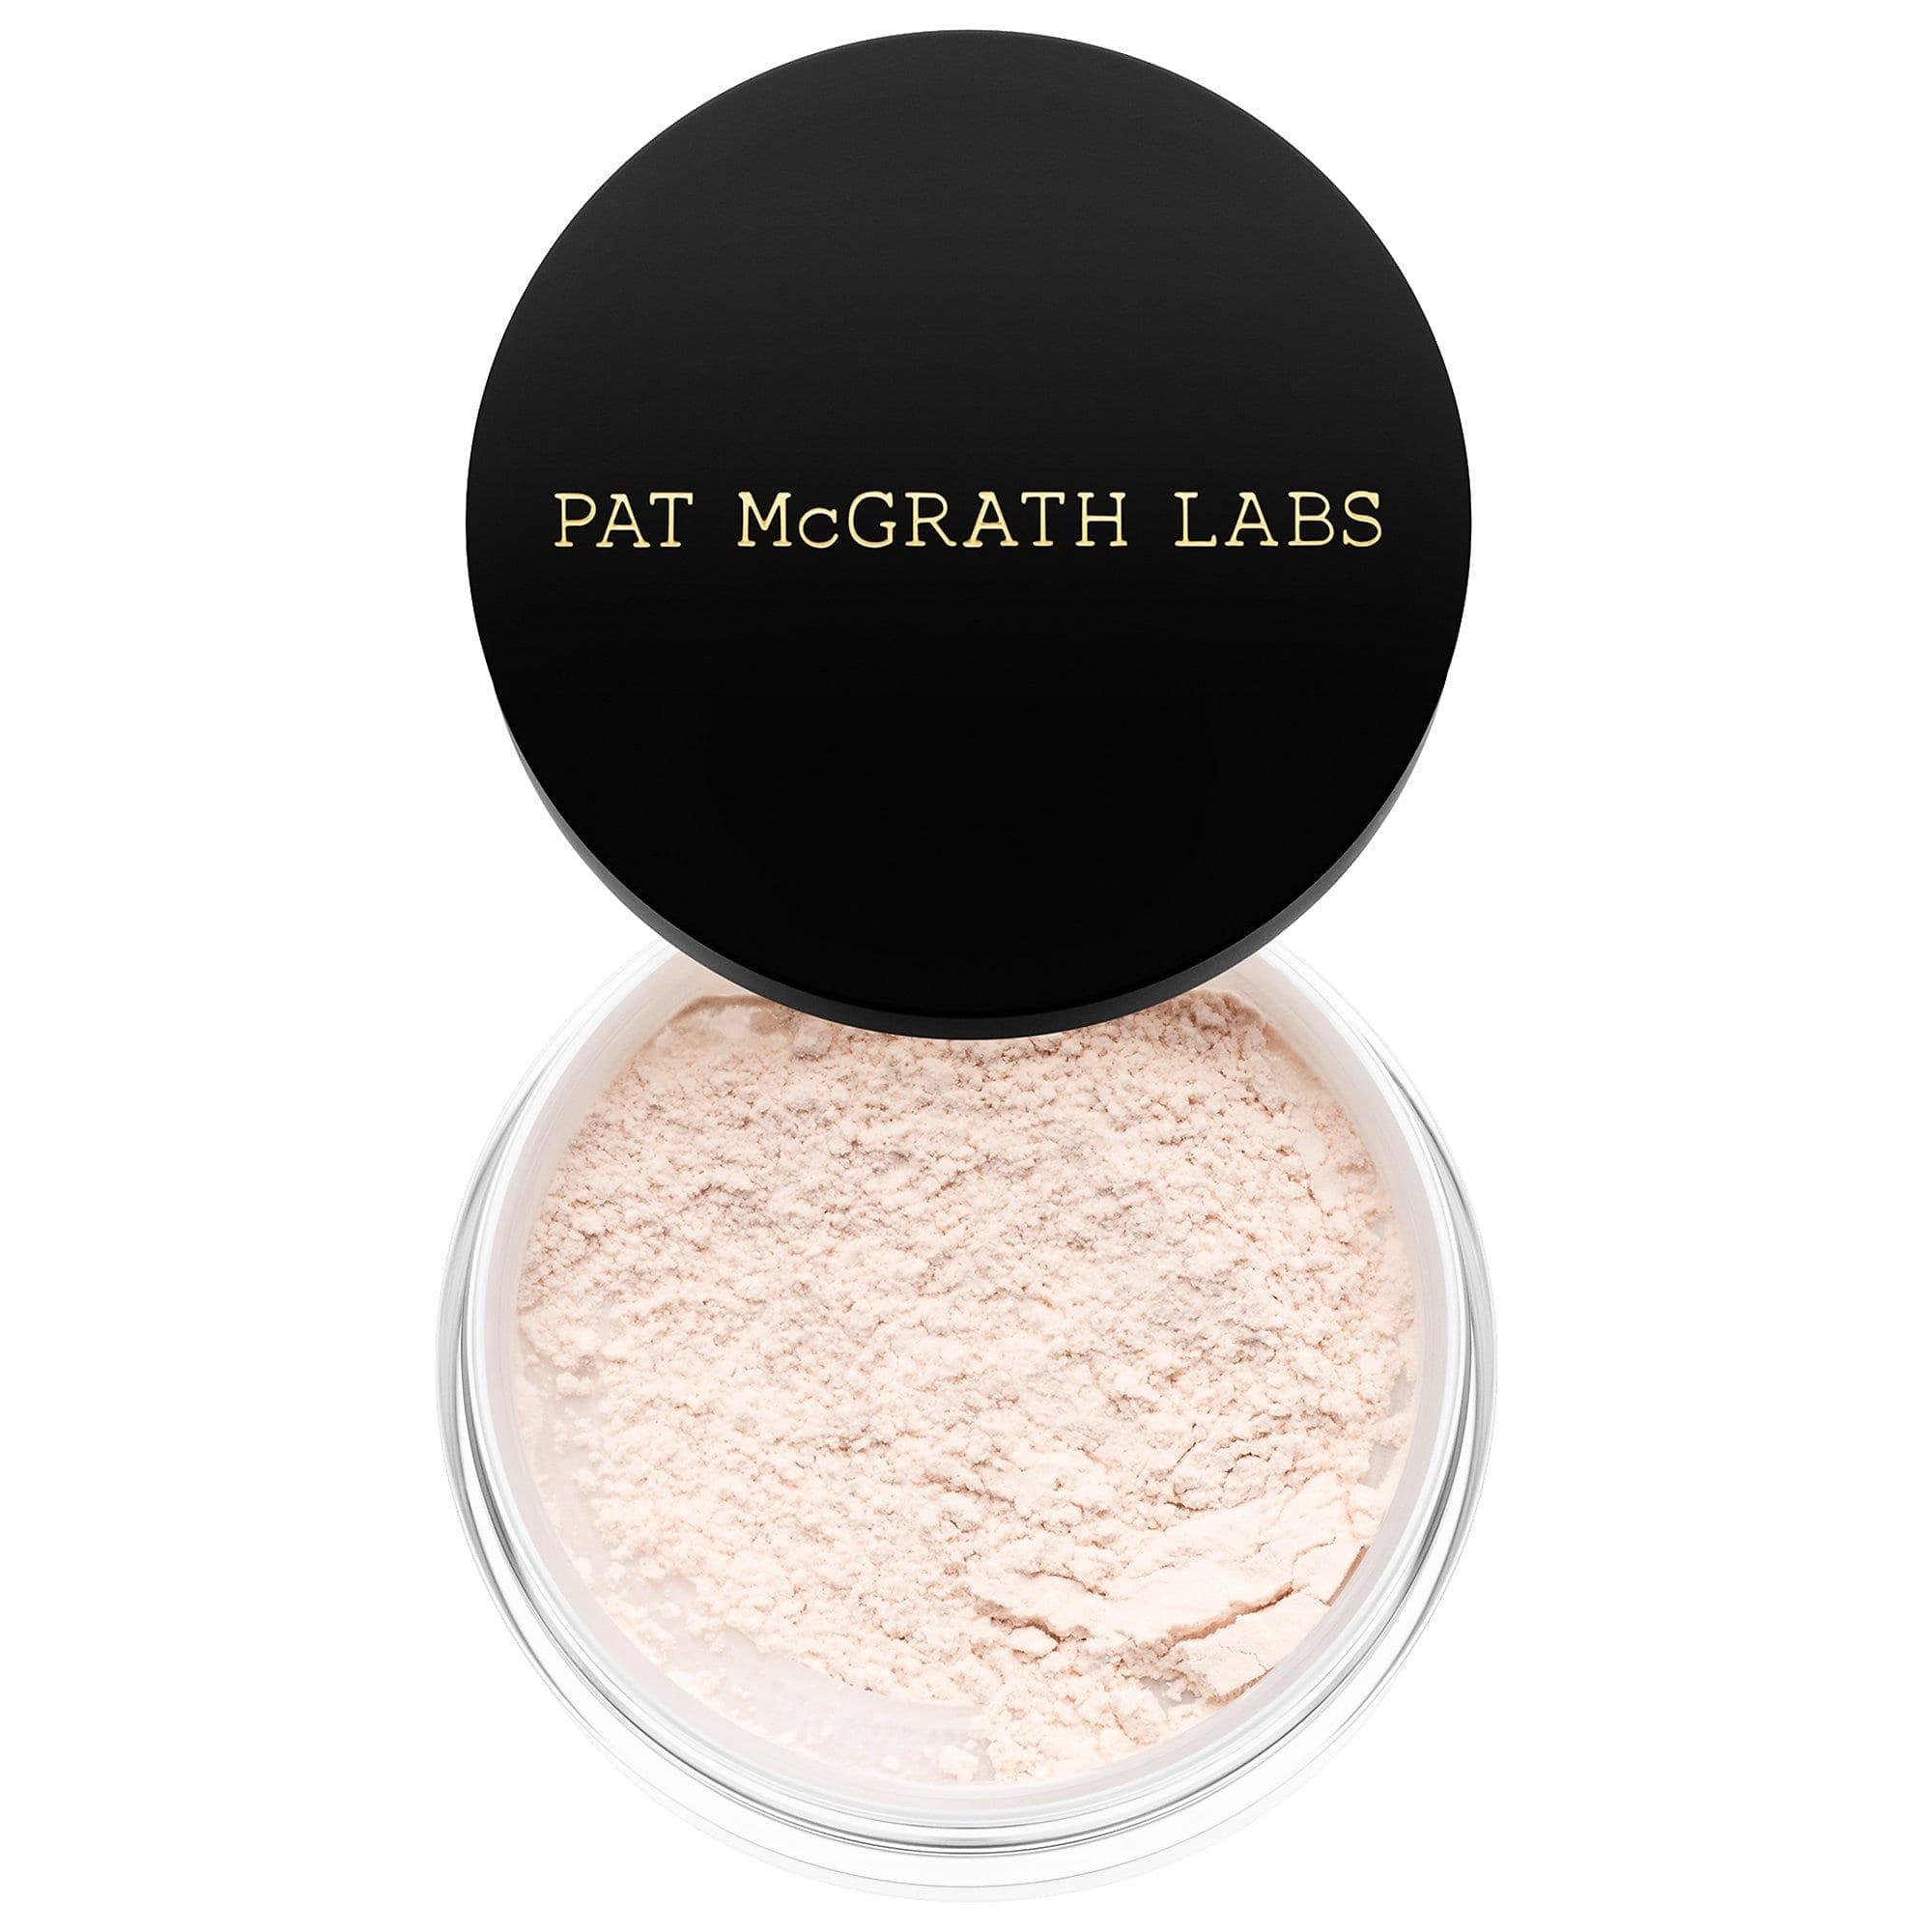 Pat McGrath Labs Skin Fetish Sublime Perfection Setting Powder Light